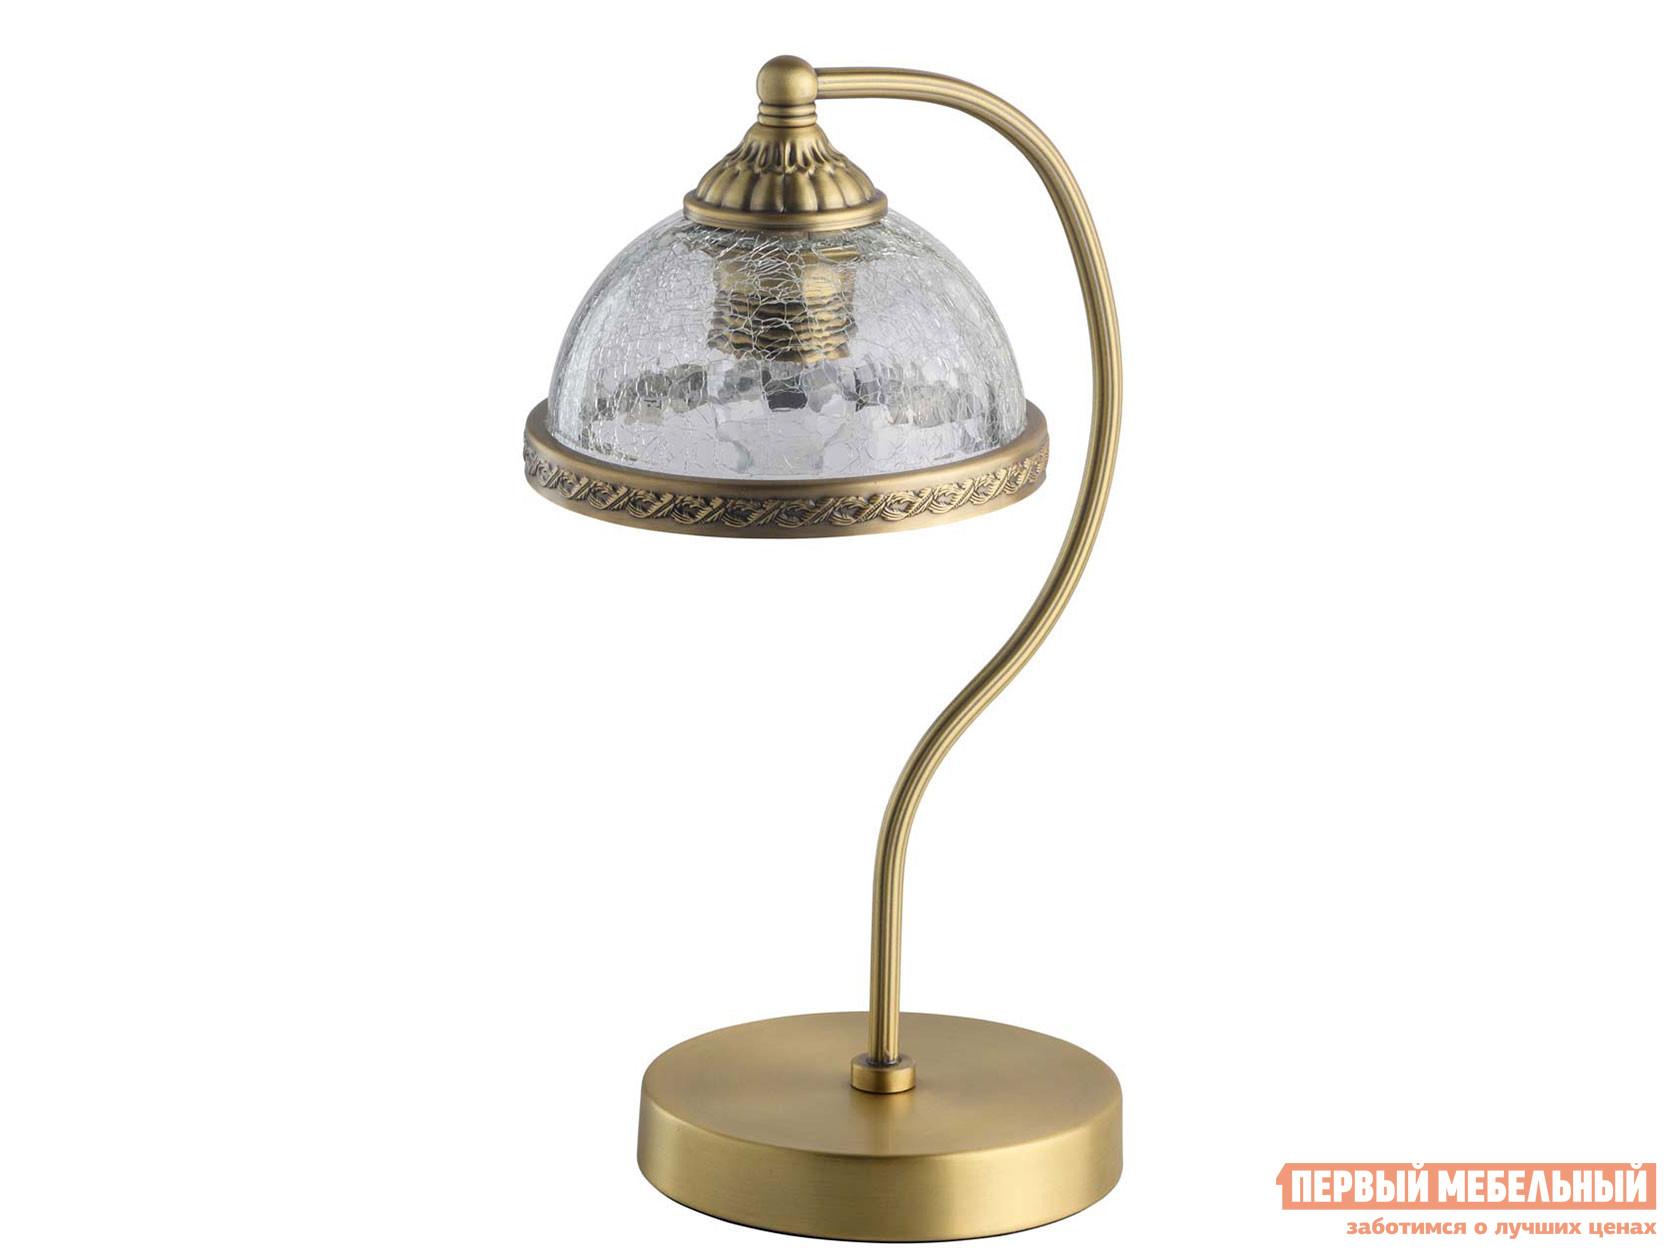 Настольная лампа Штерн 481033701 Аманда недорого